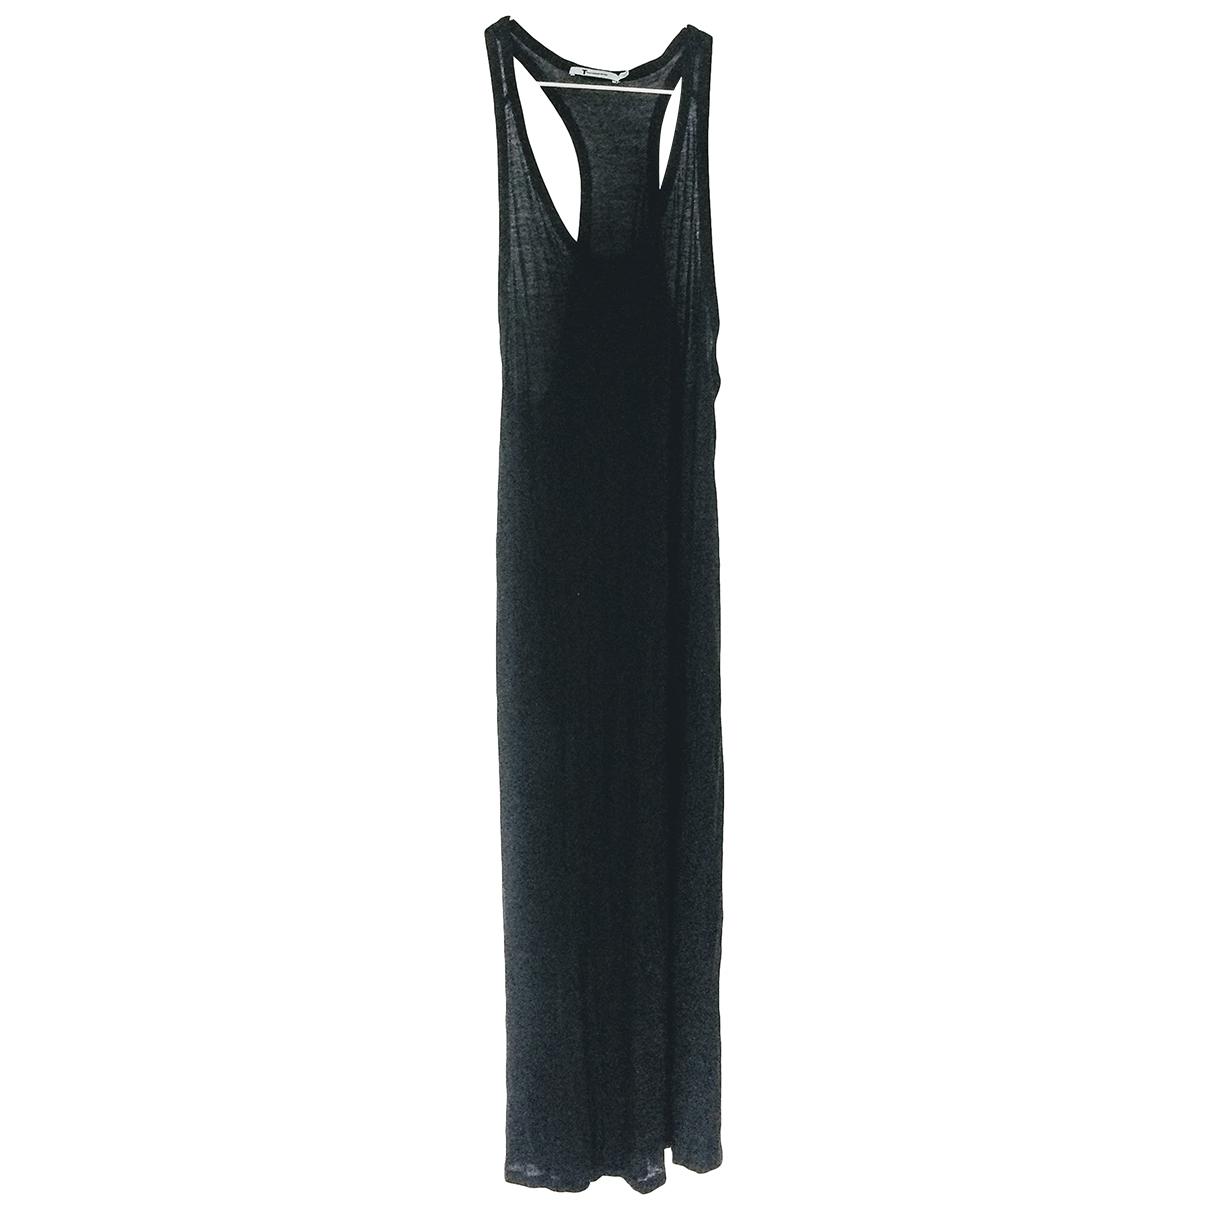 T By Alexander Wang \N Black Cotton dress for Women L International